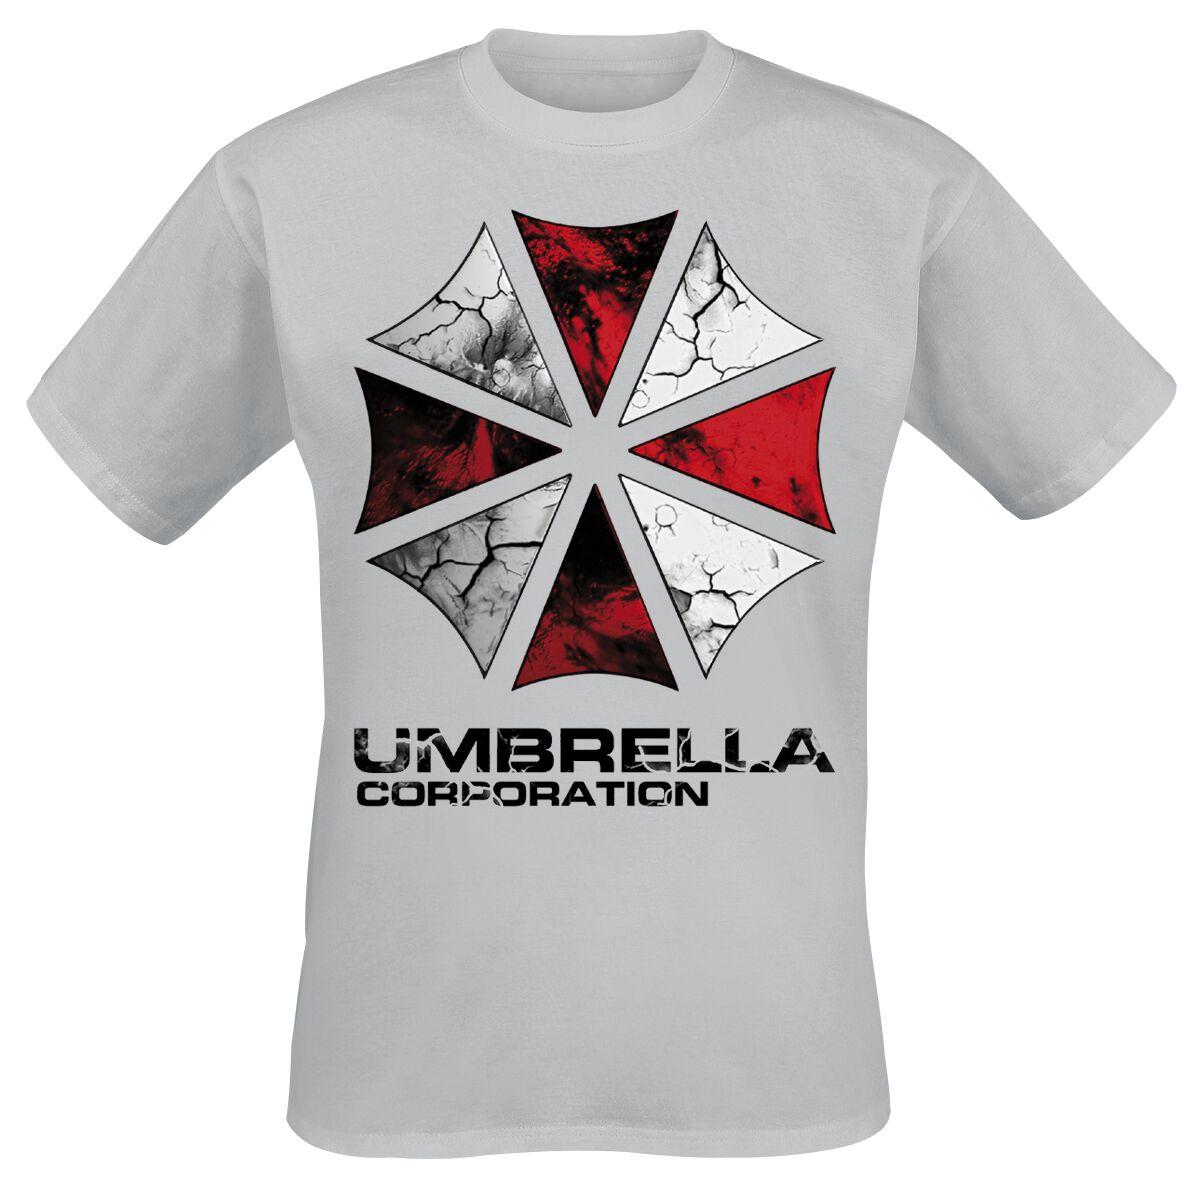 Merch dla Fanów - Koszulki - T-Shirt Resident Evil The Umbrella Corporation T-Shirt odcienie szarego - 357231